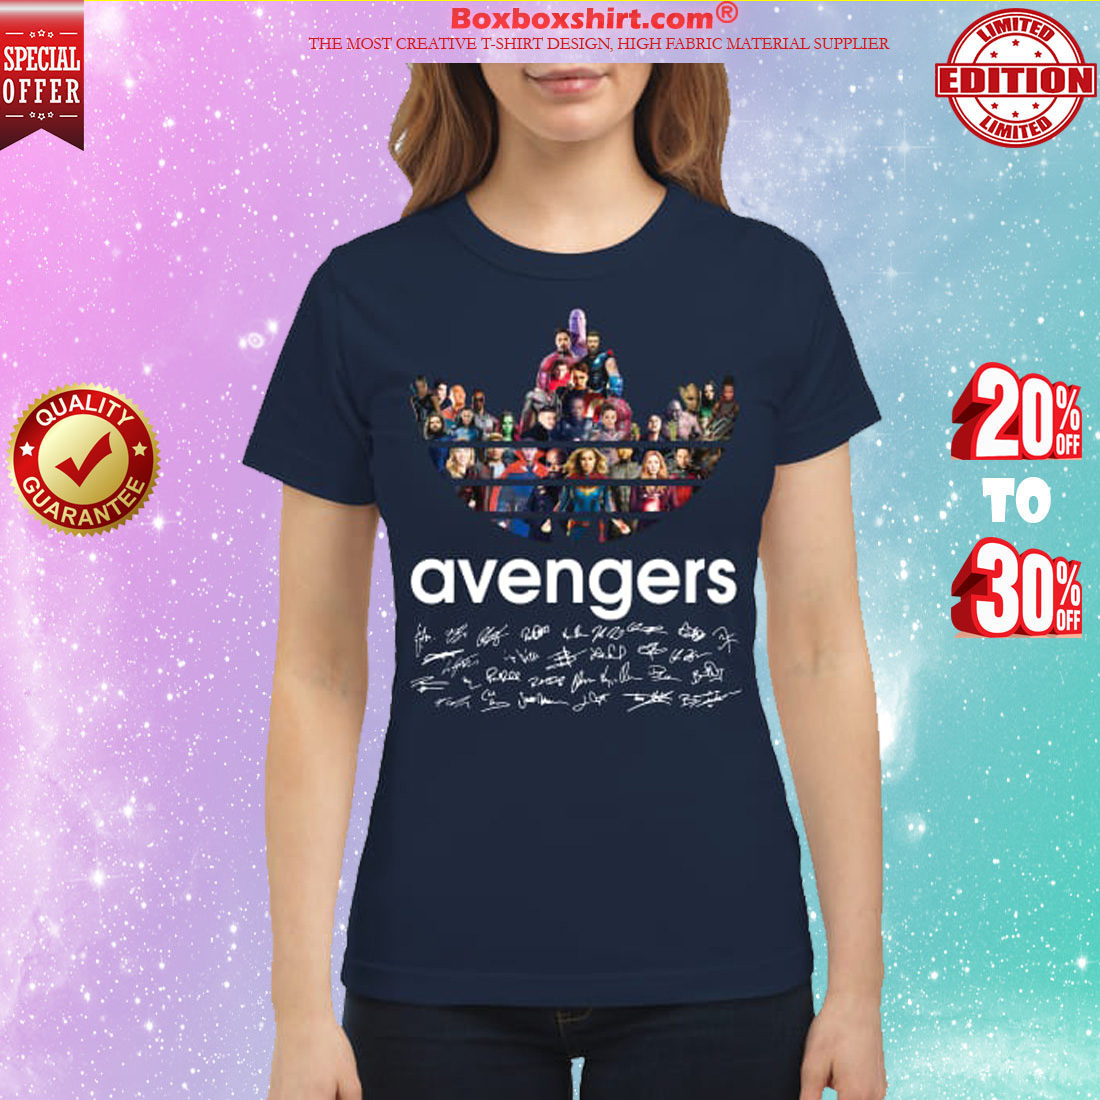 Adidas Avengers Signatures classic shirt